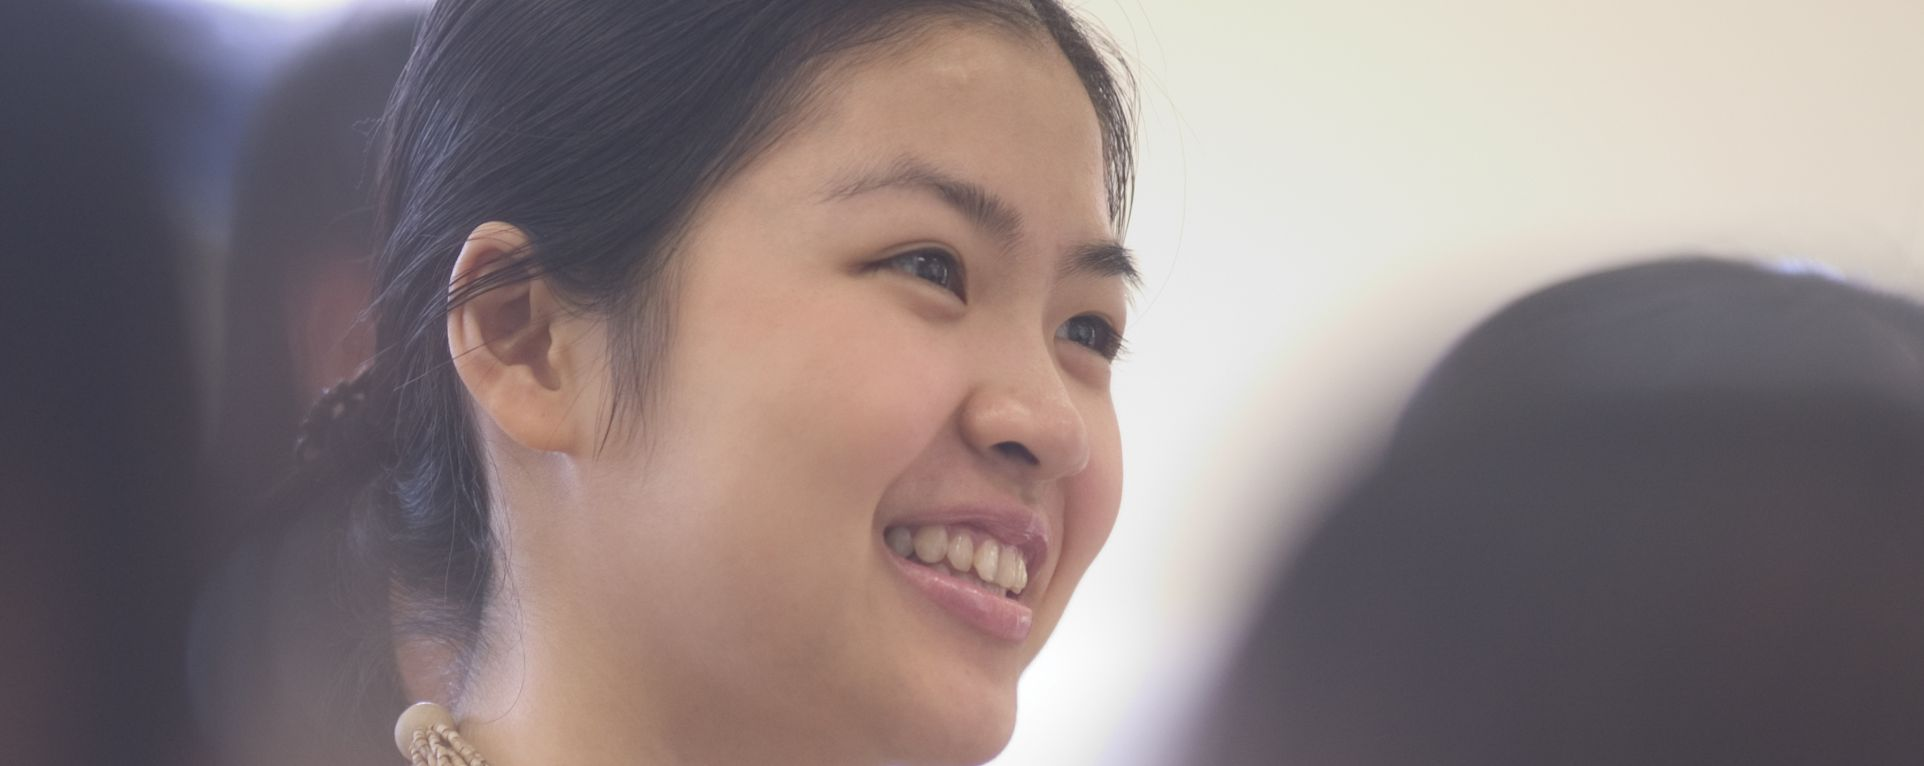 Female Asian Student